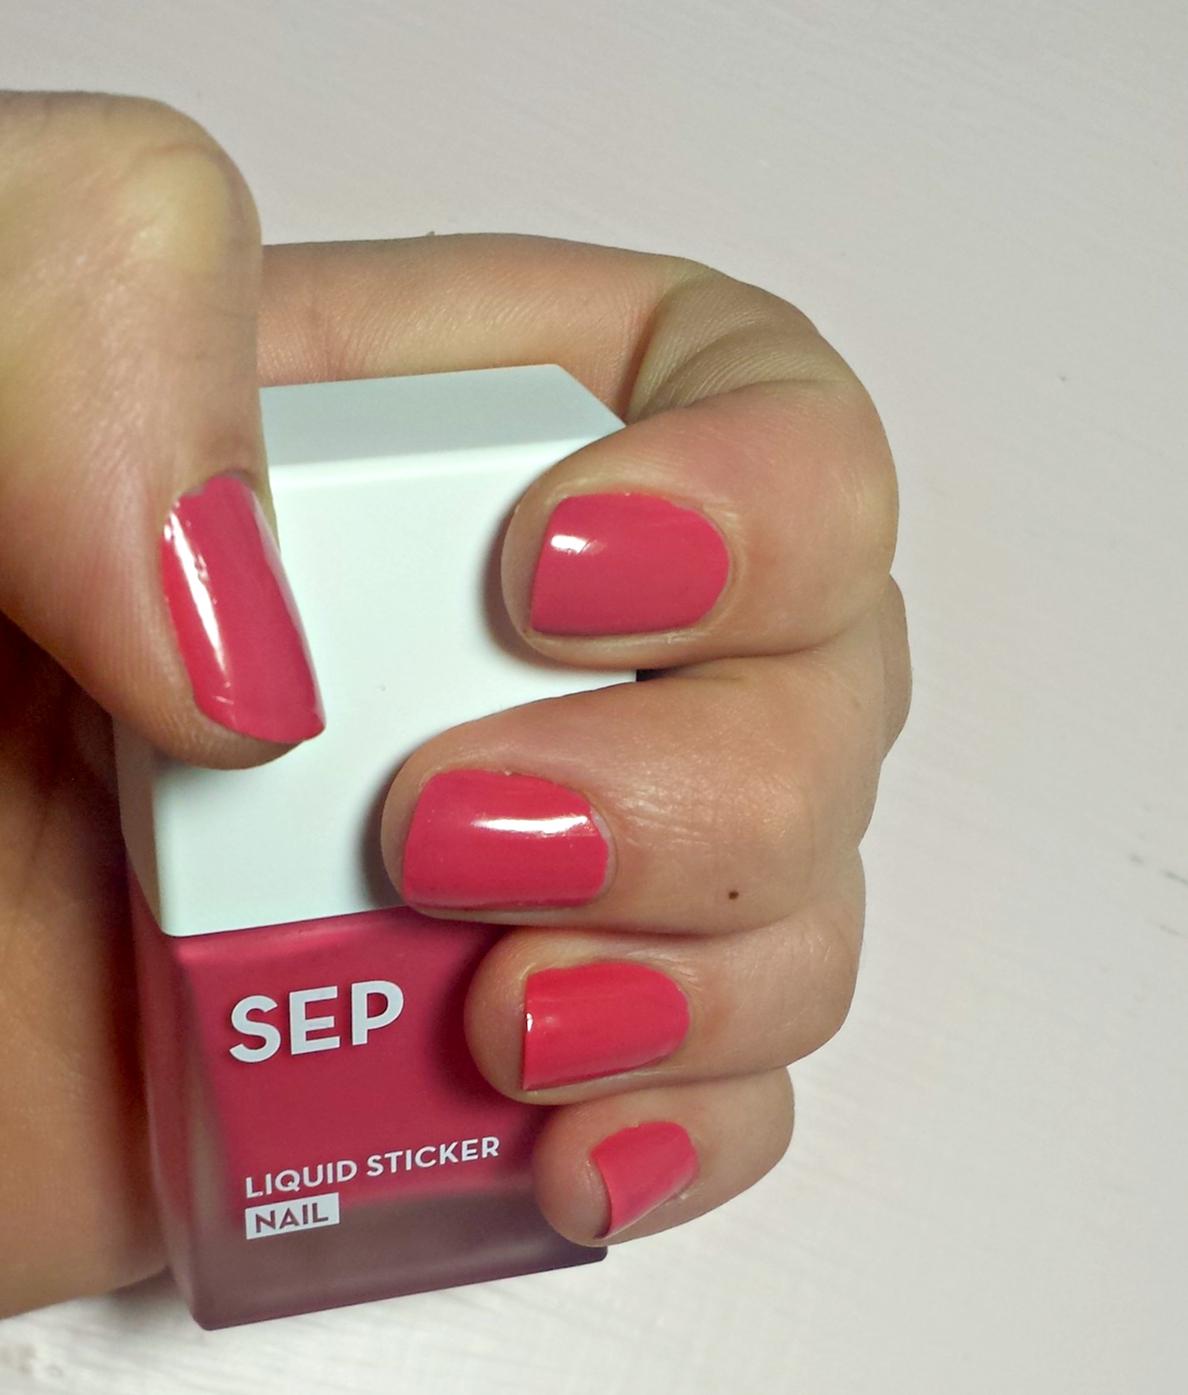 SEP Beauty Liquid Sticker Nail Polish Review